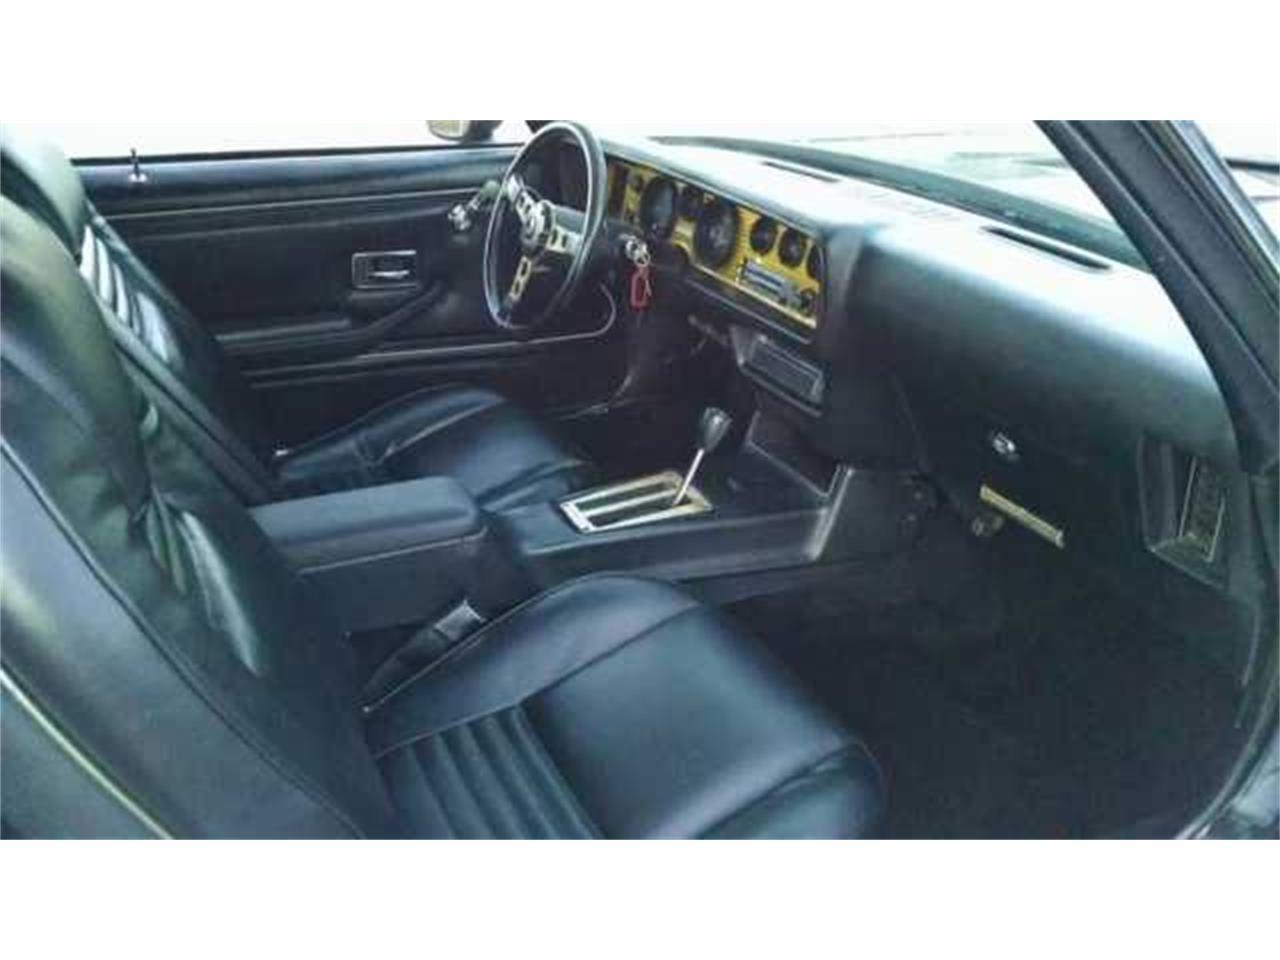 1979 Pontiac Firebird Trans Am (CC-1234066) for sale in West Pittston, Pennsylvania